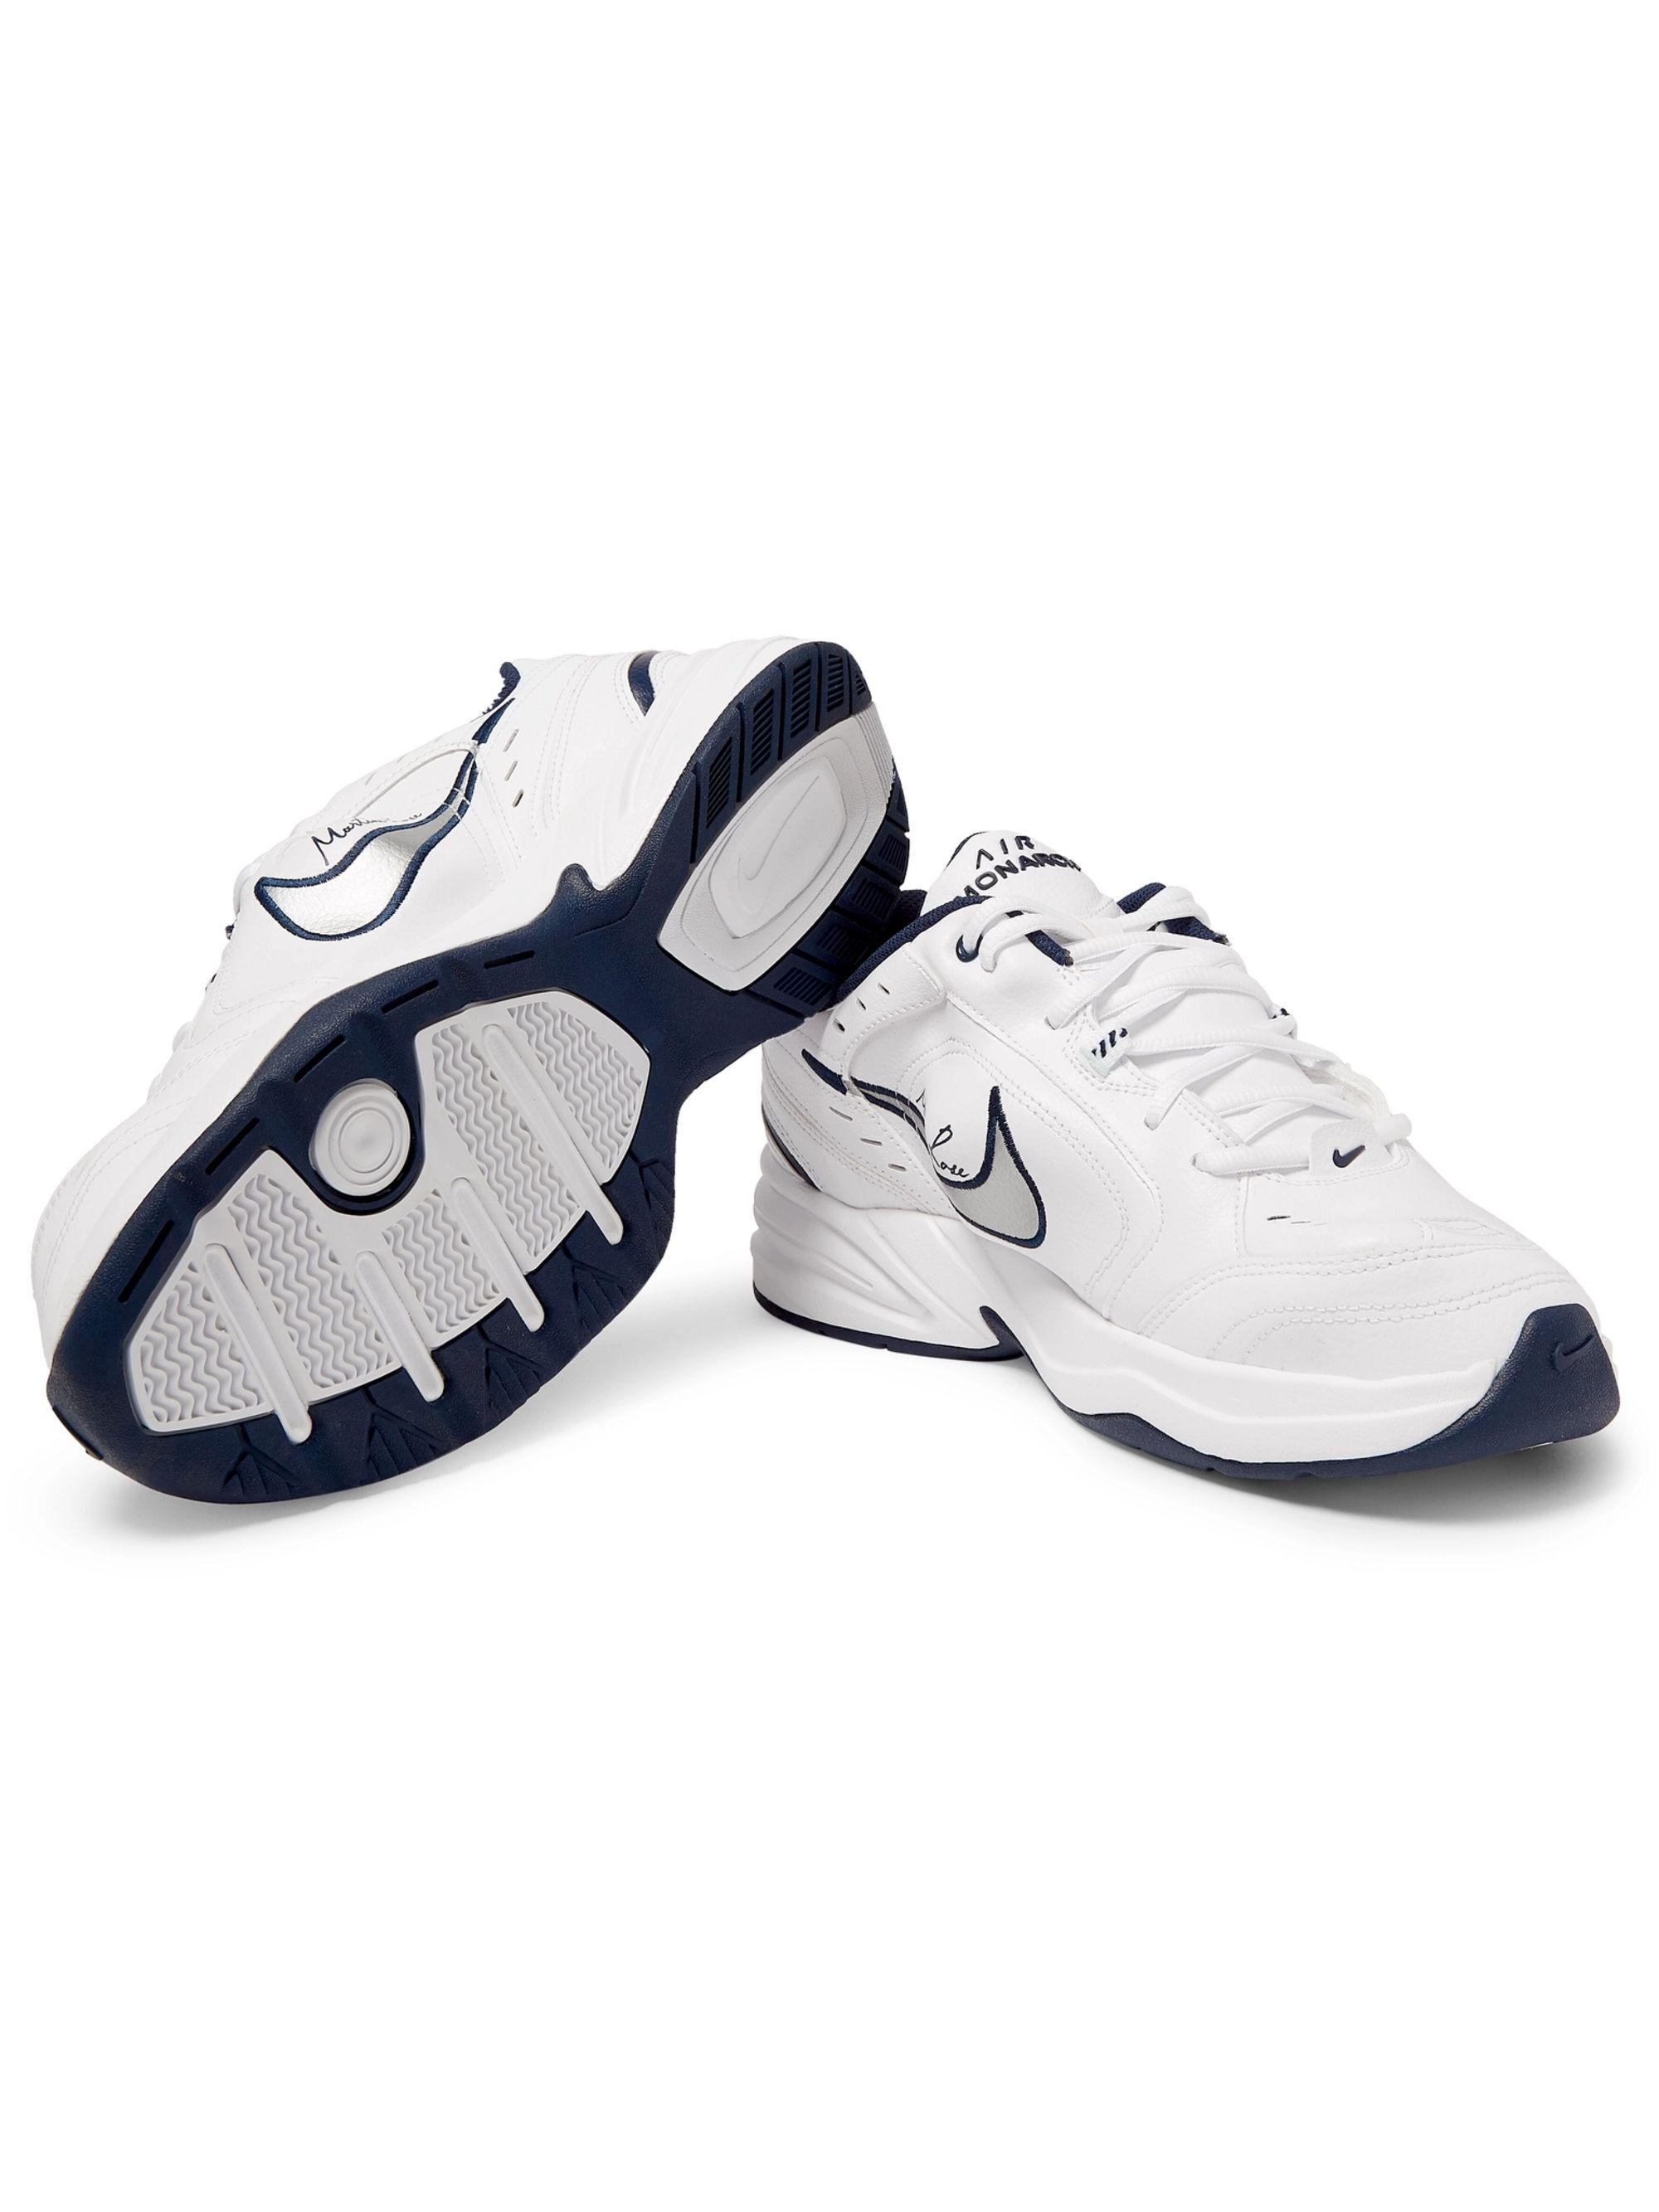 Nike Martine Rose X Air Monarch Iv White Navy | Grailed